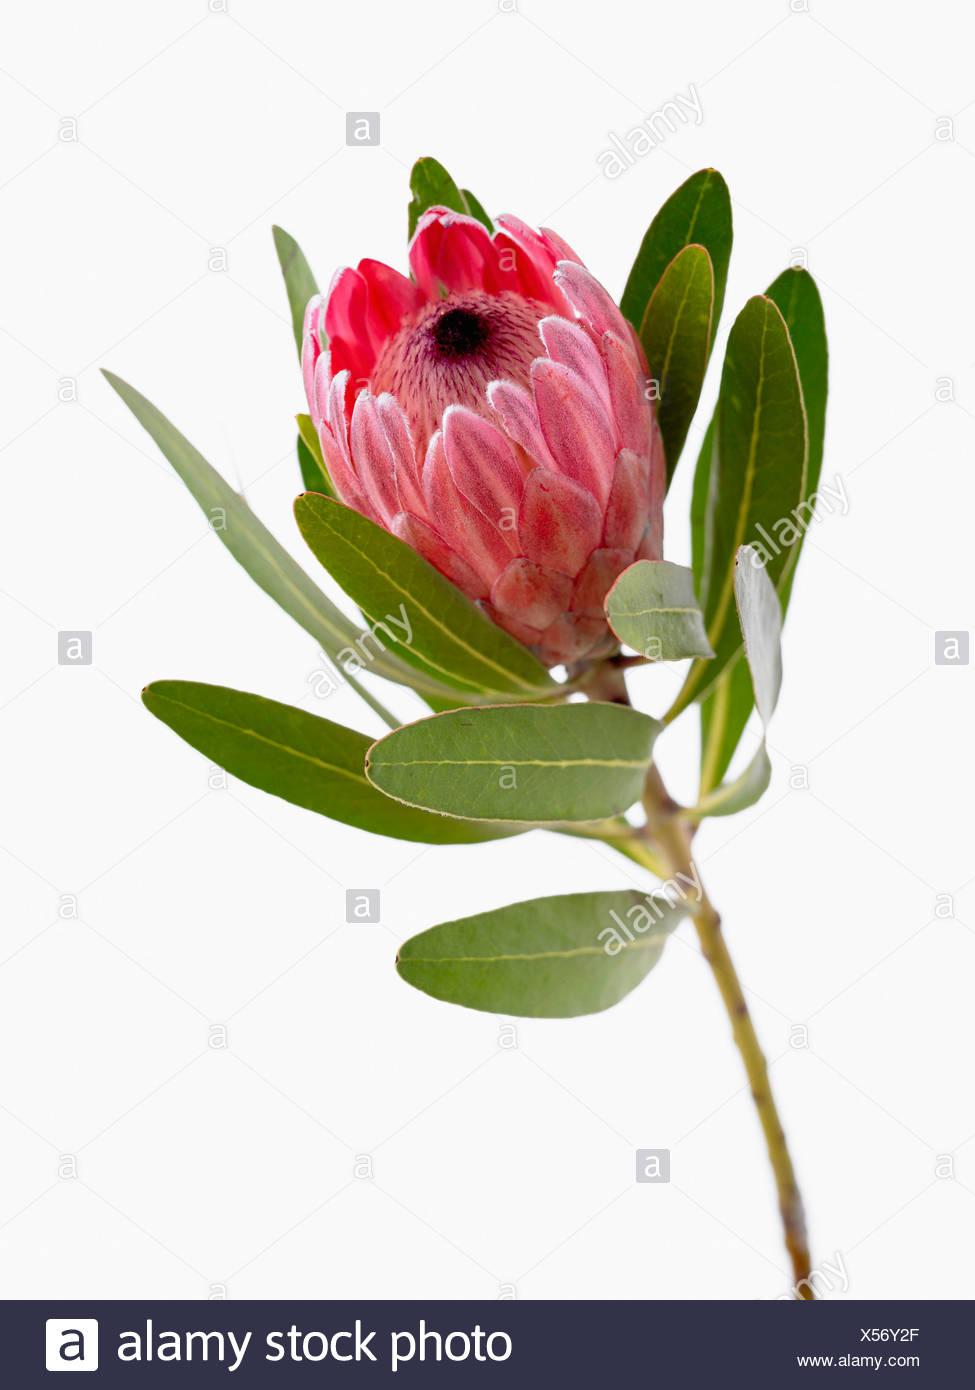 Protea Neriifolia X Susannae Pink Ice Single Flower On Leafy Stem Against A White Background Stock Photo Alamy